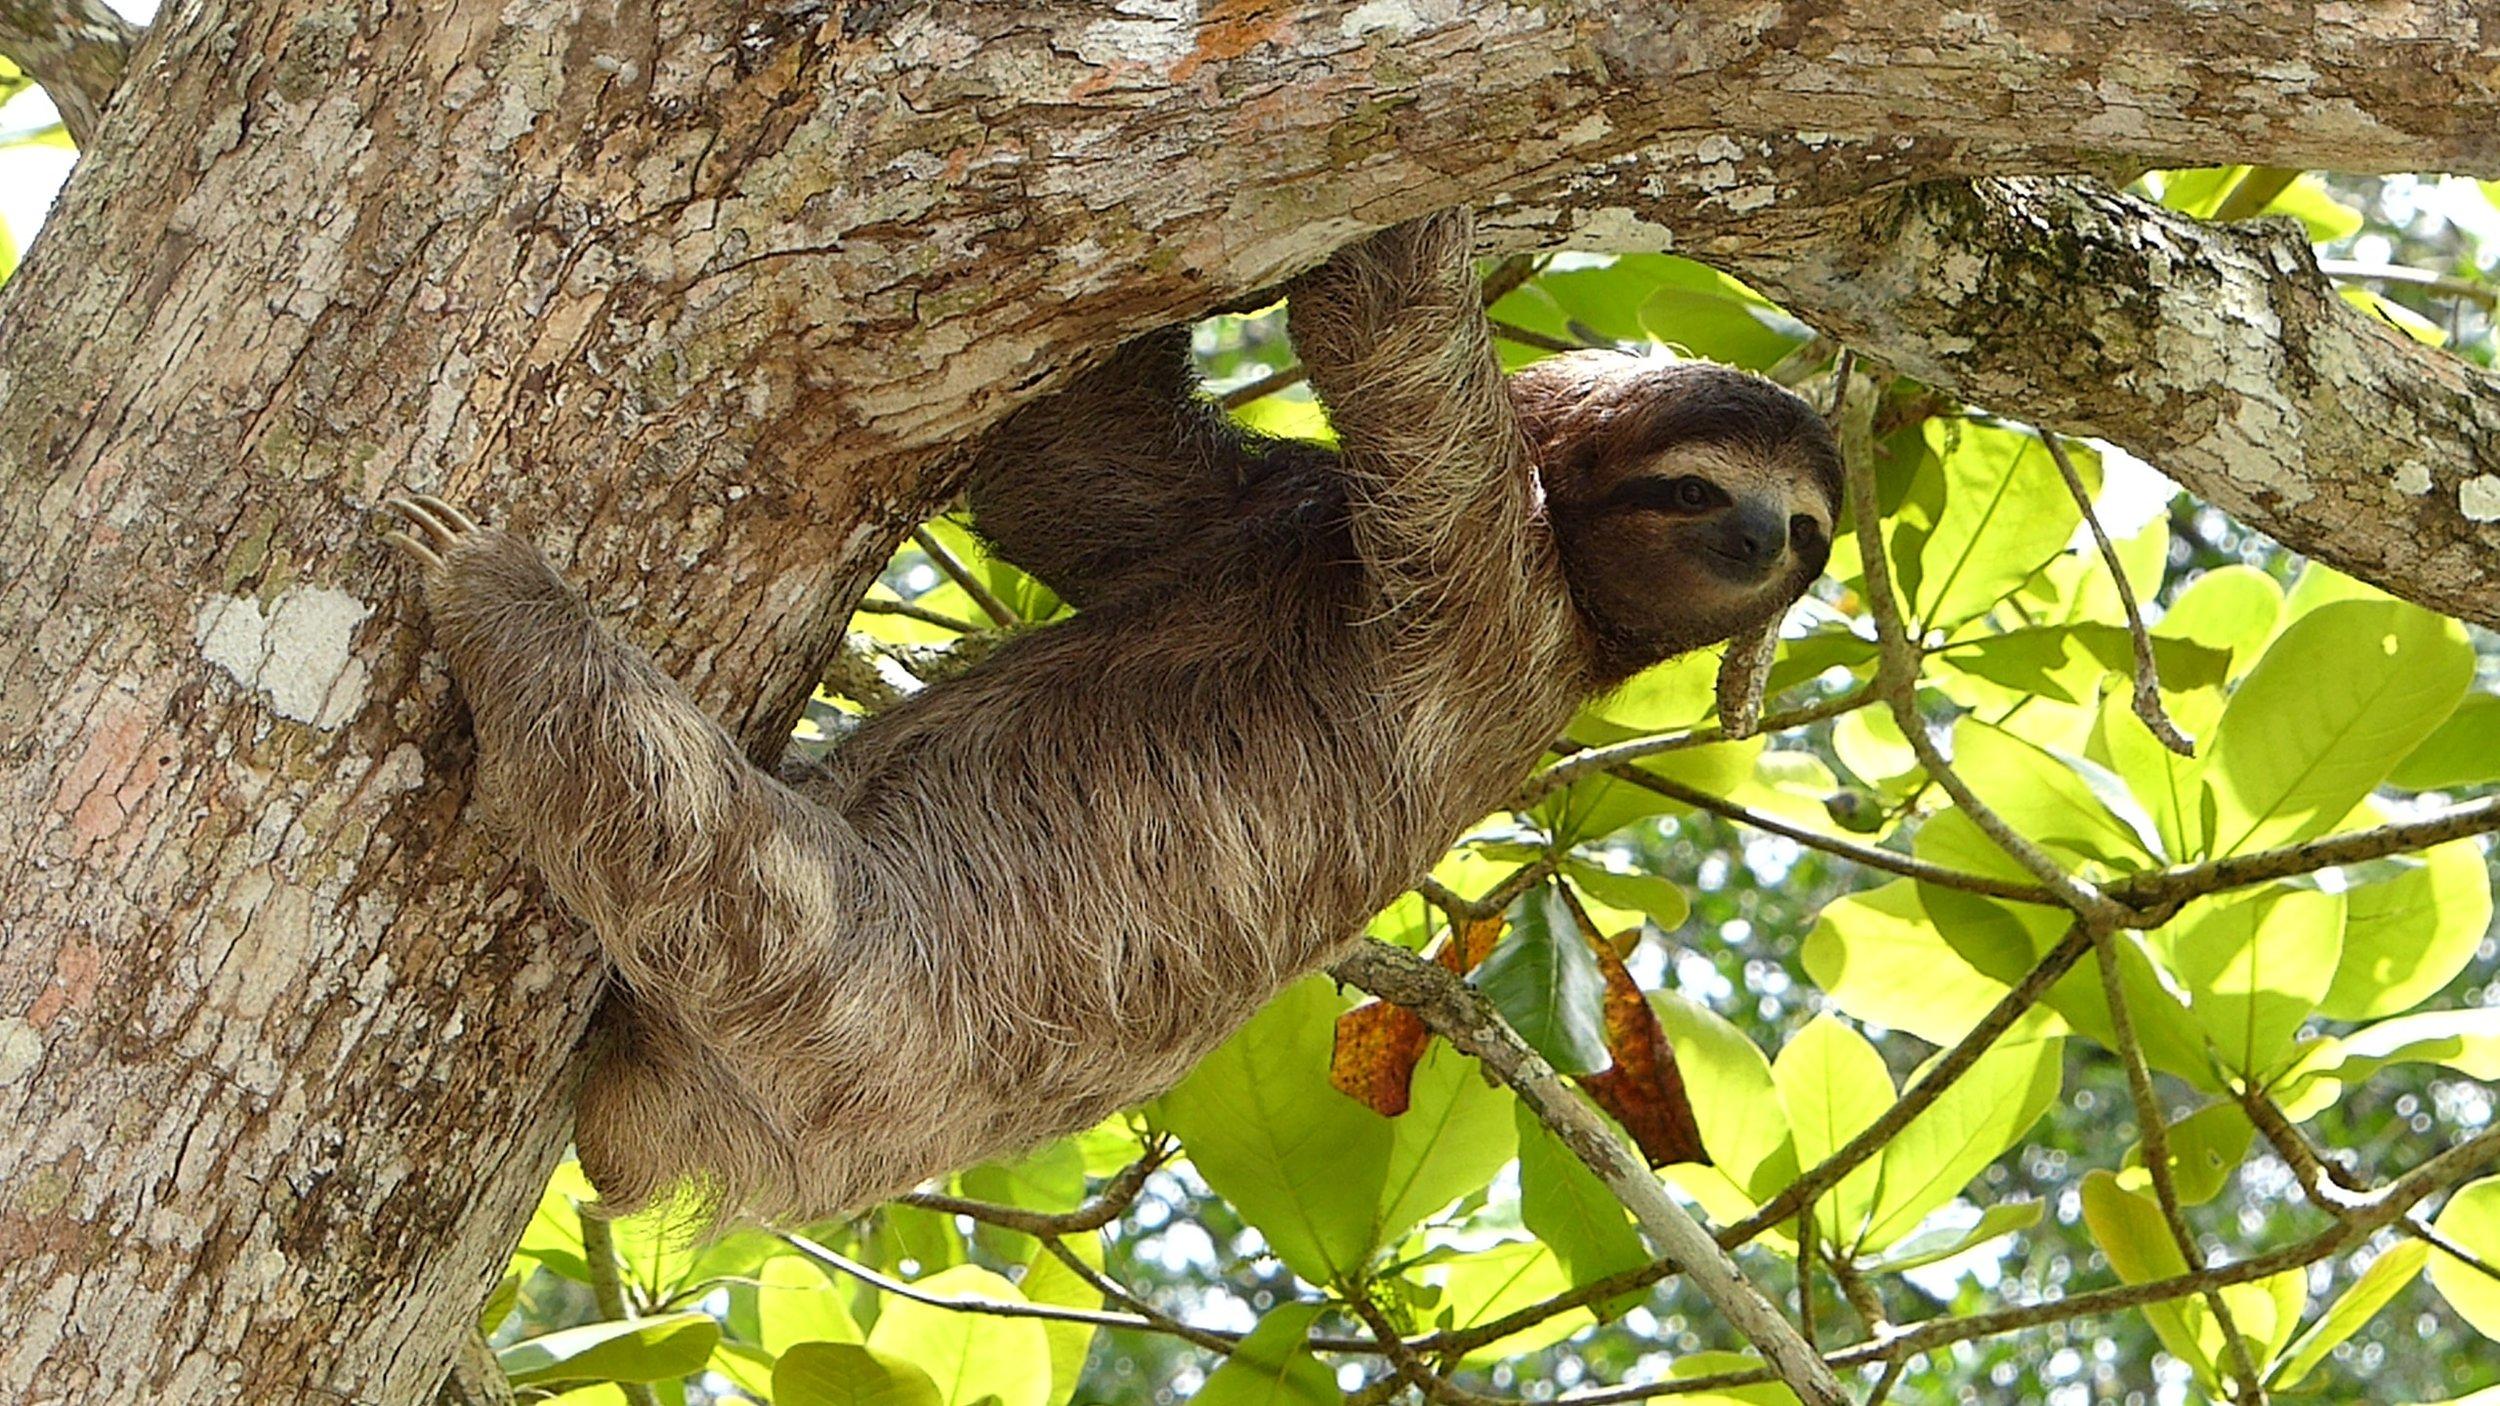 Sloth_Costa Rica_Perezoso.jpg